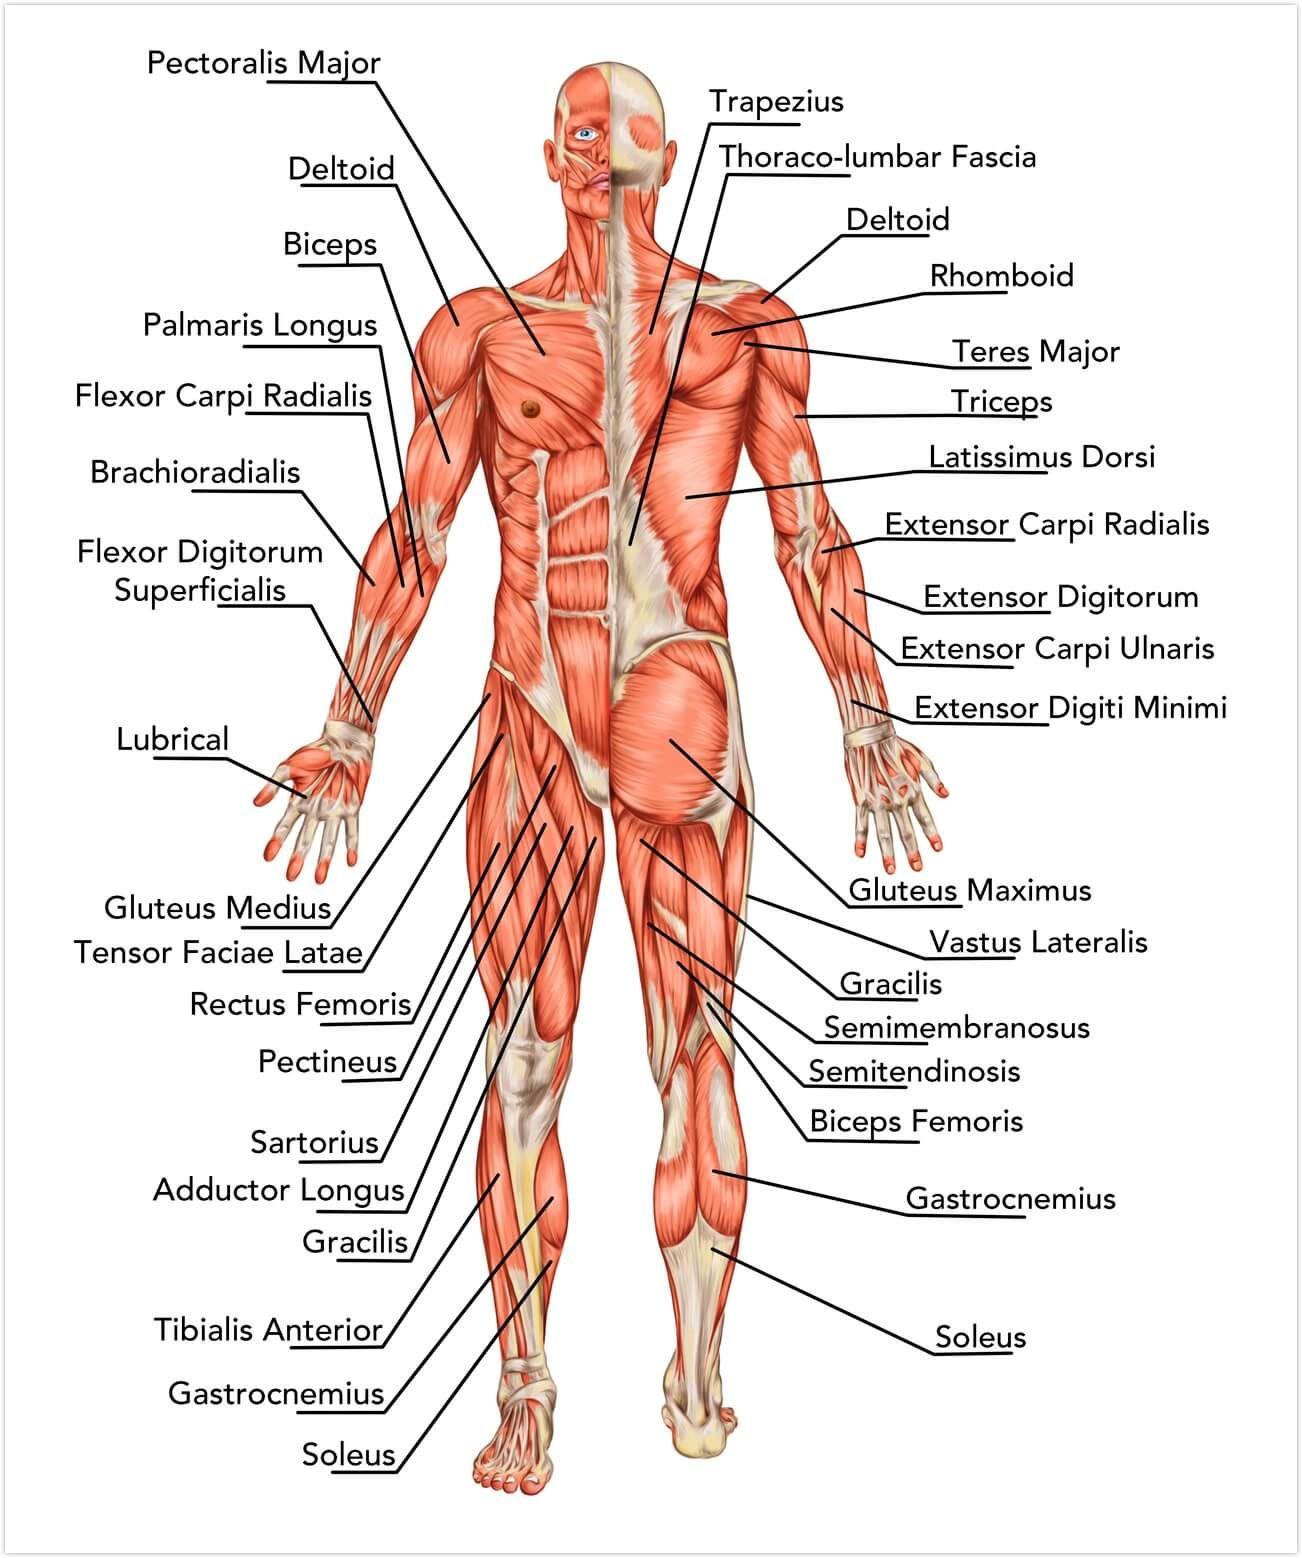 Muskulatur des Menschen | masage | Pinterest | Der mensch, Medizin ...